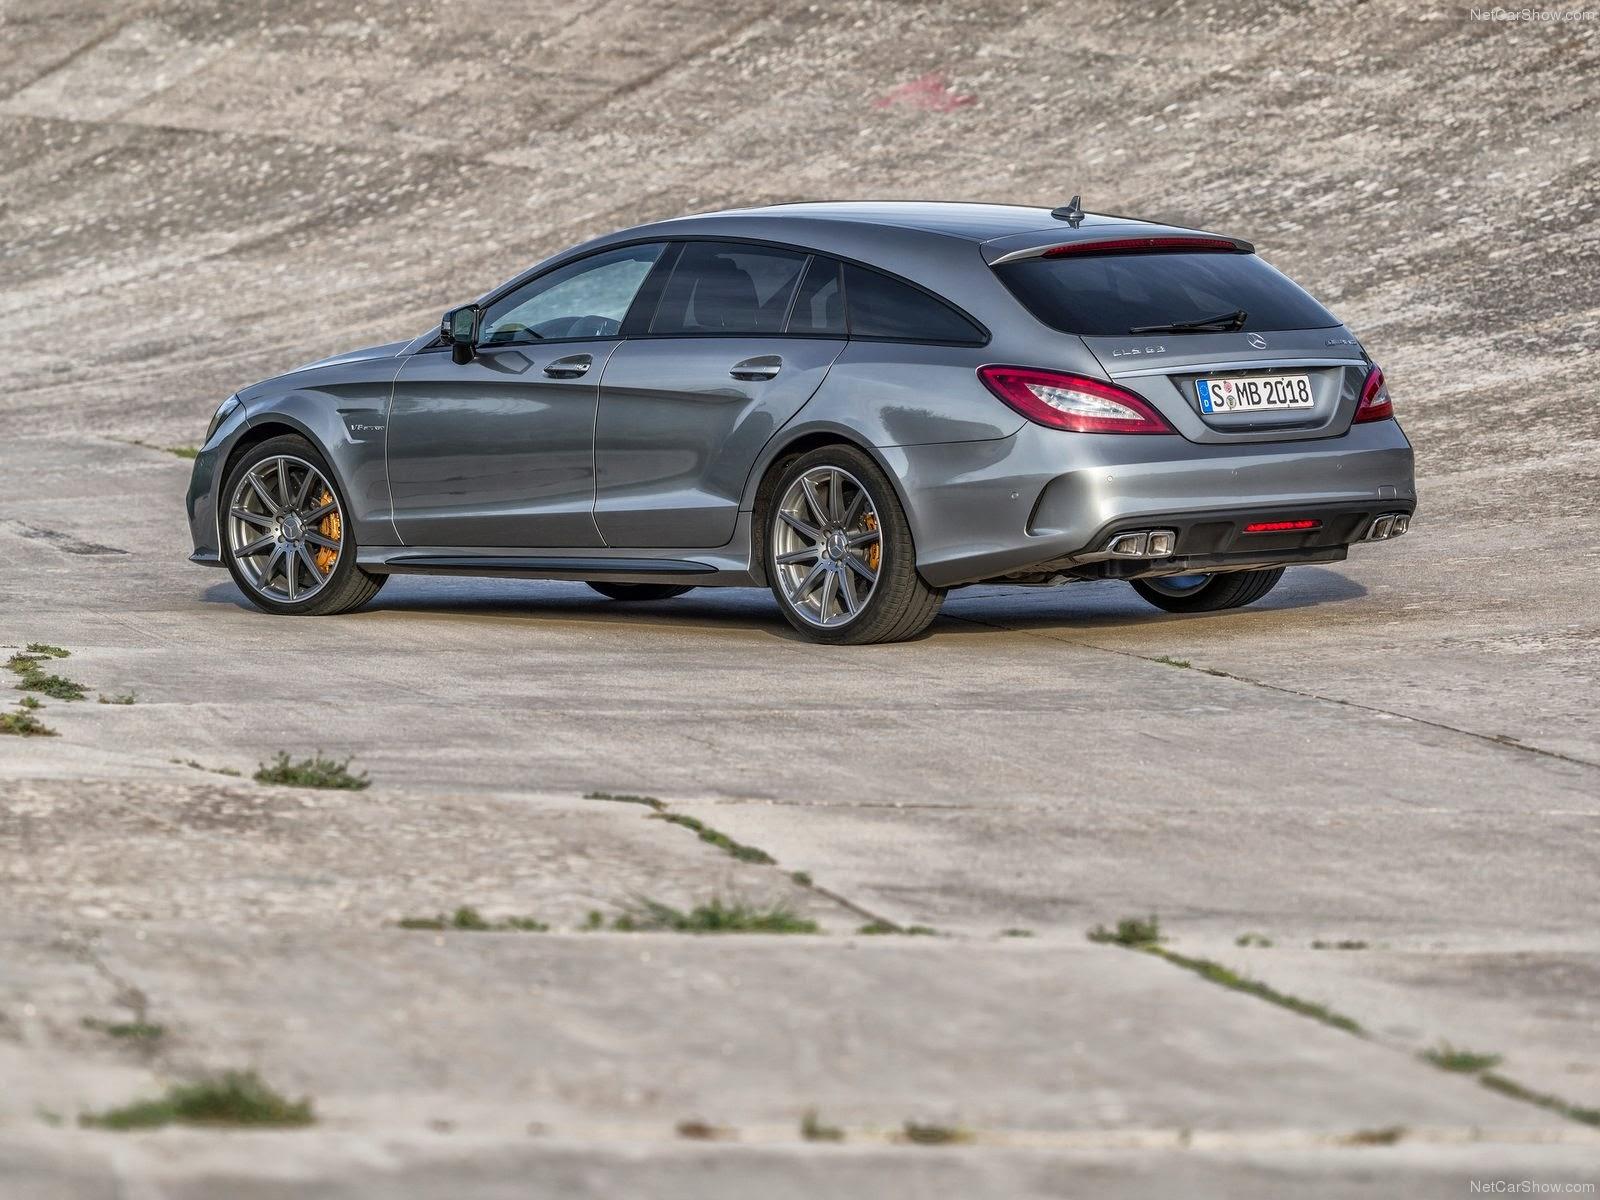 Mercedes-Benz-CLS63_AMG_Shooting_Brake_2015_1600x1200_wallpaper_12.jpg